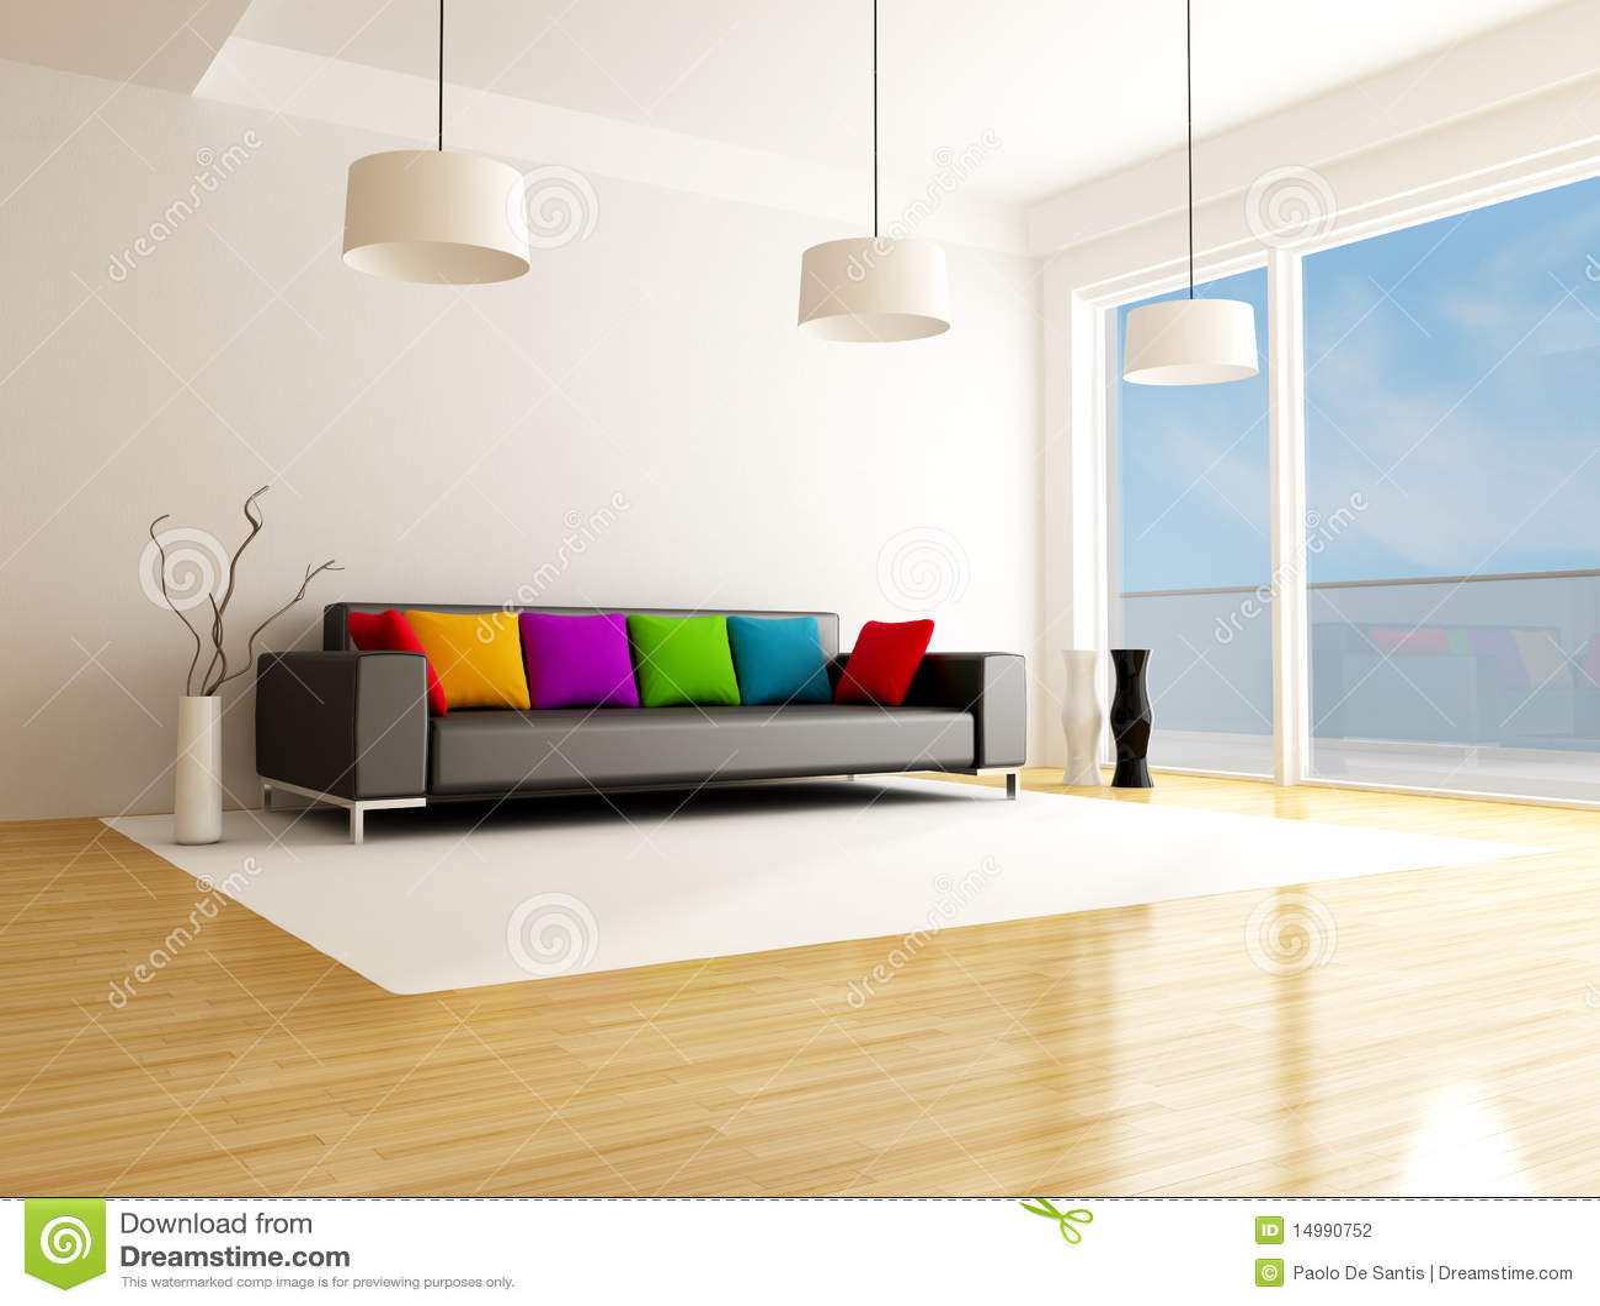 Moderne Gekleurde Woonkamer Stock Illustratie - Illustratie ...